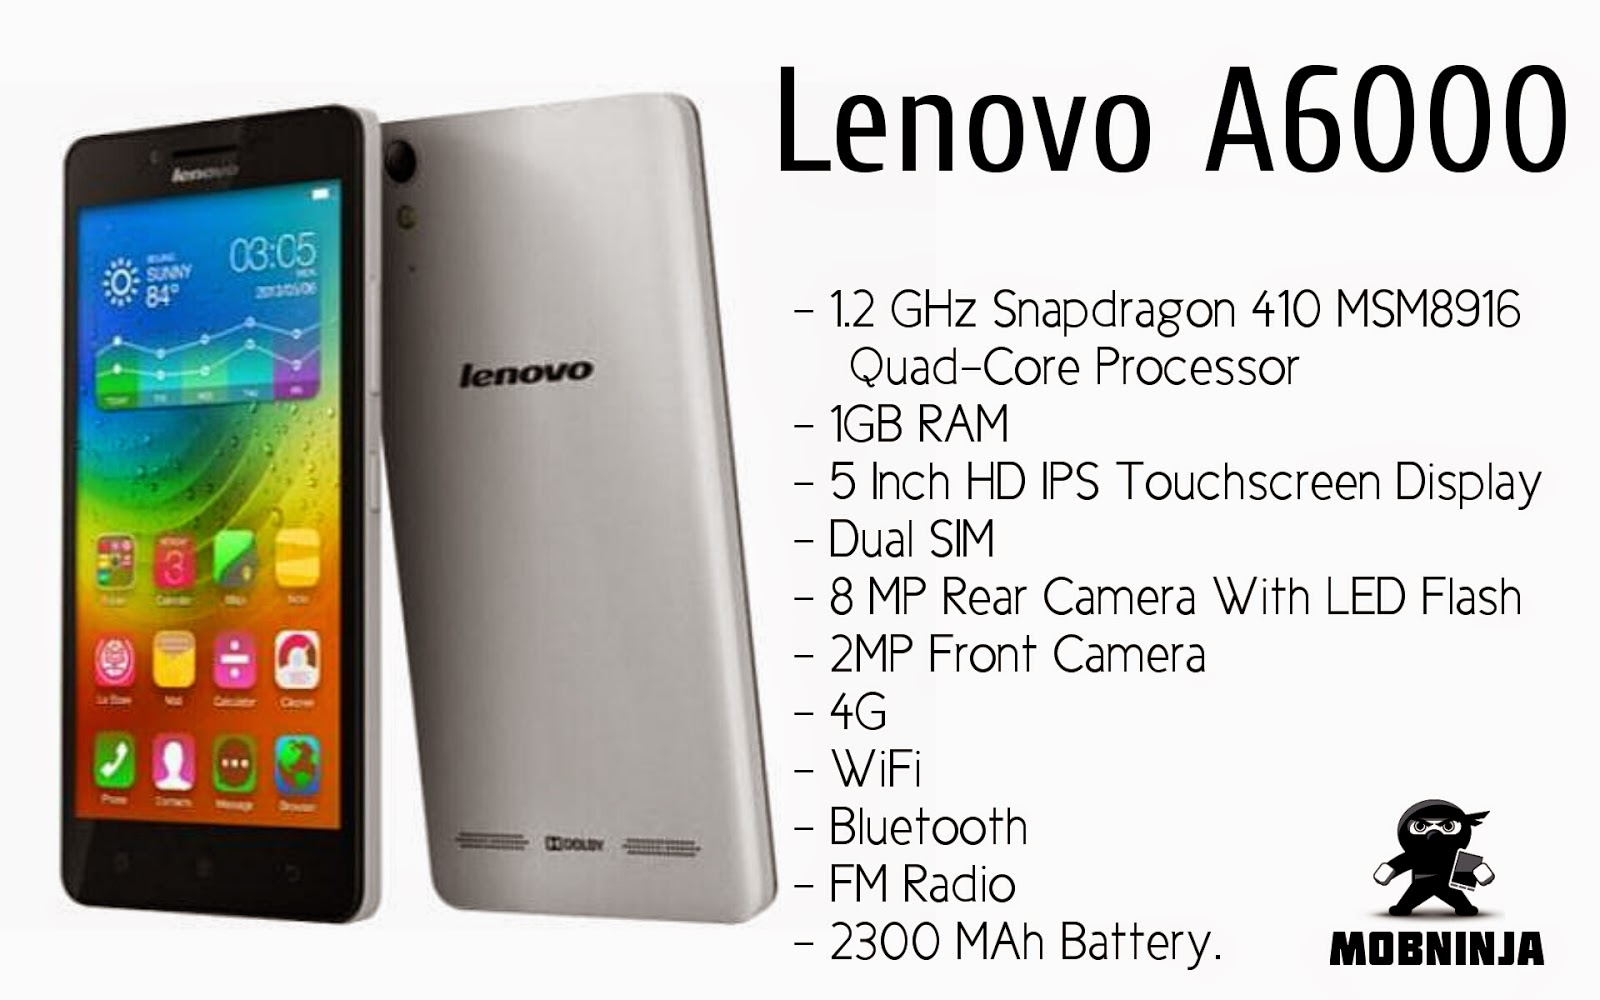 Mobo Ninja Lenovo A6000 Best For Its Price